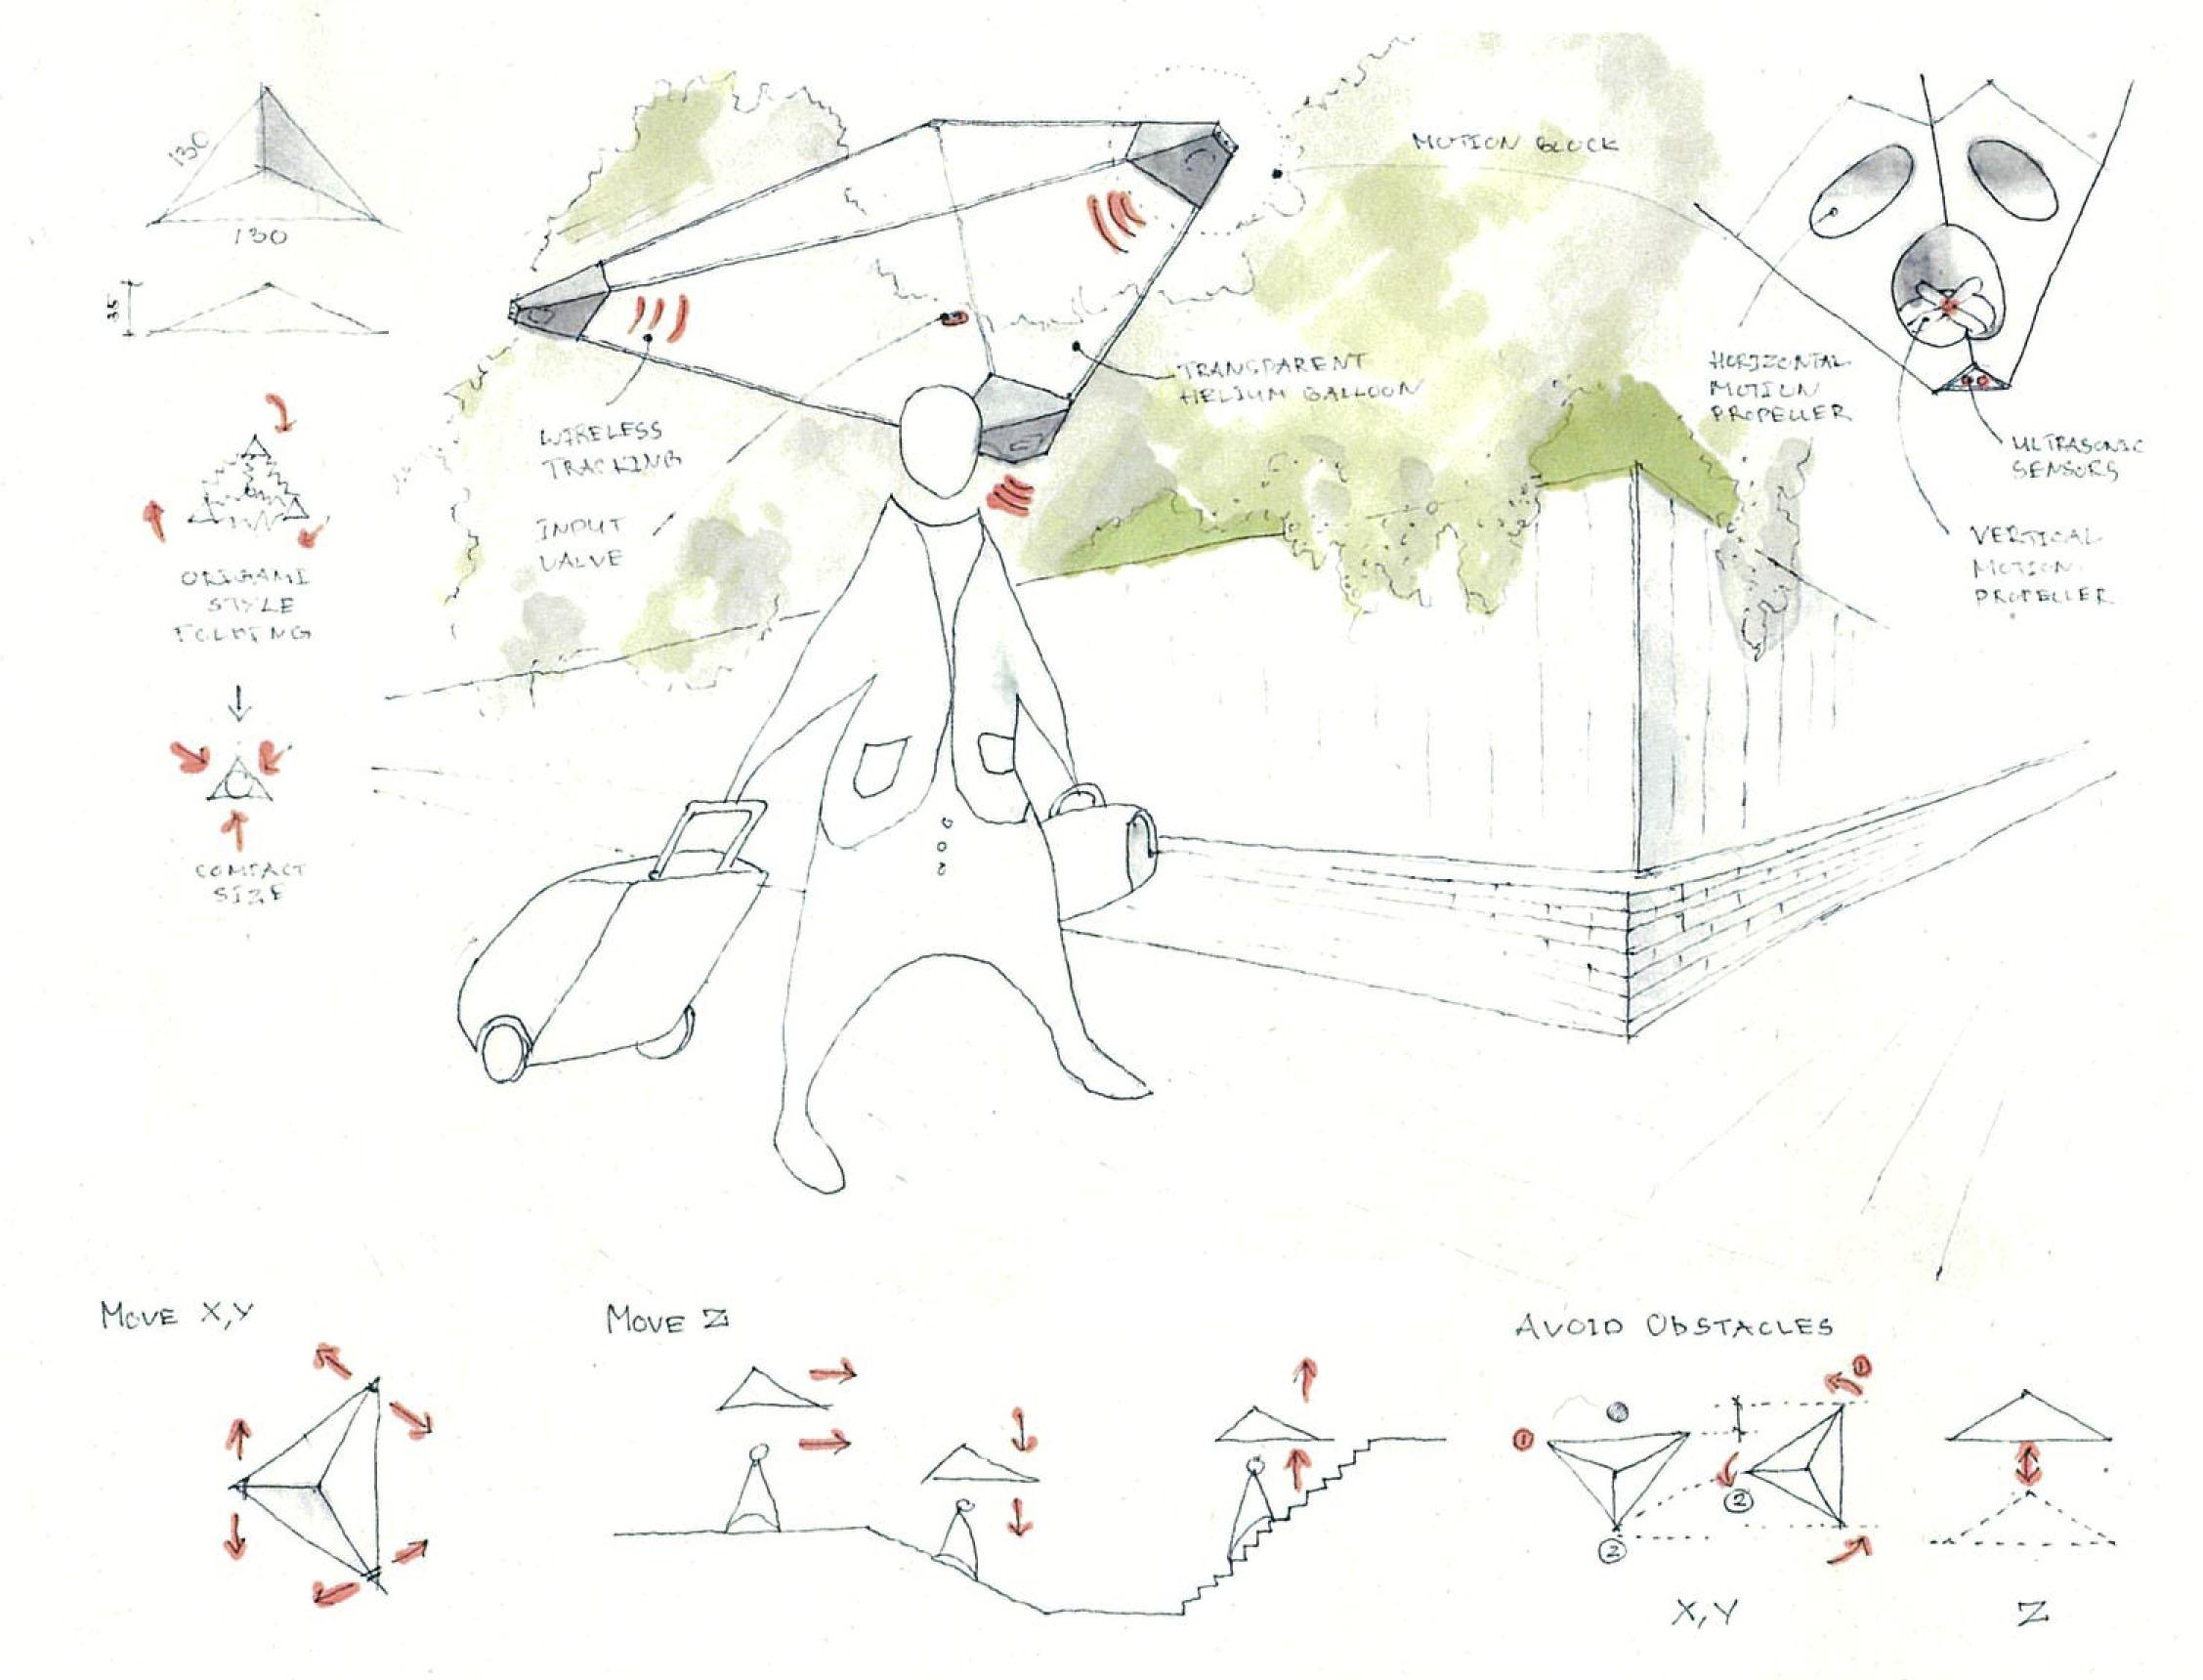 """ MAGICASA"" (magic umbrella) image sketch in 2017"